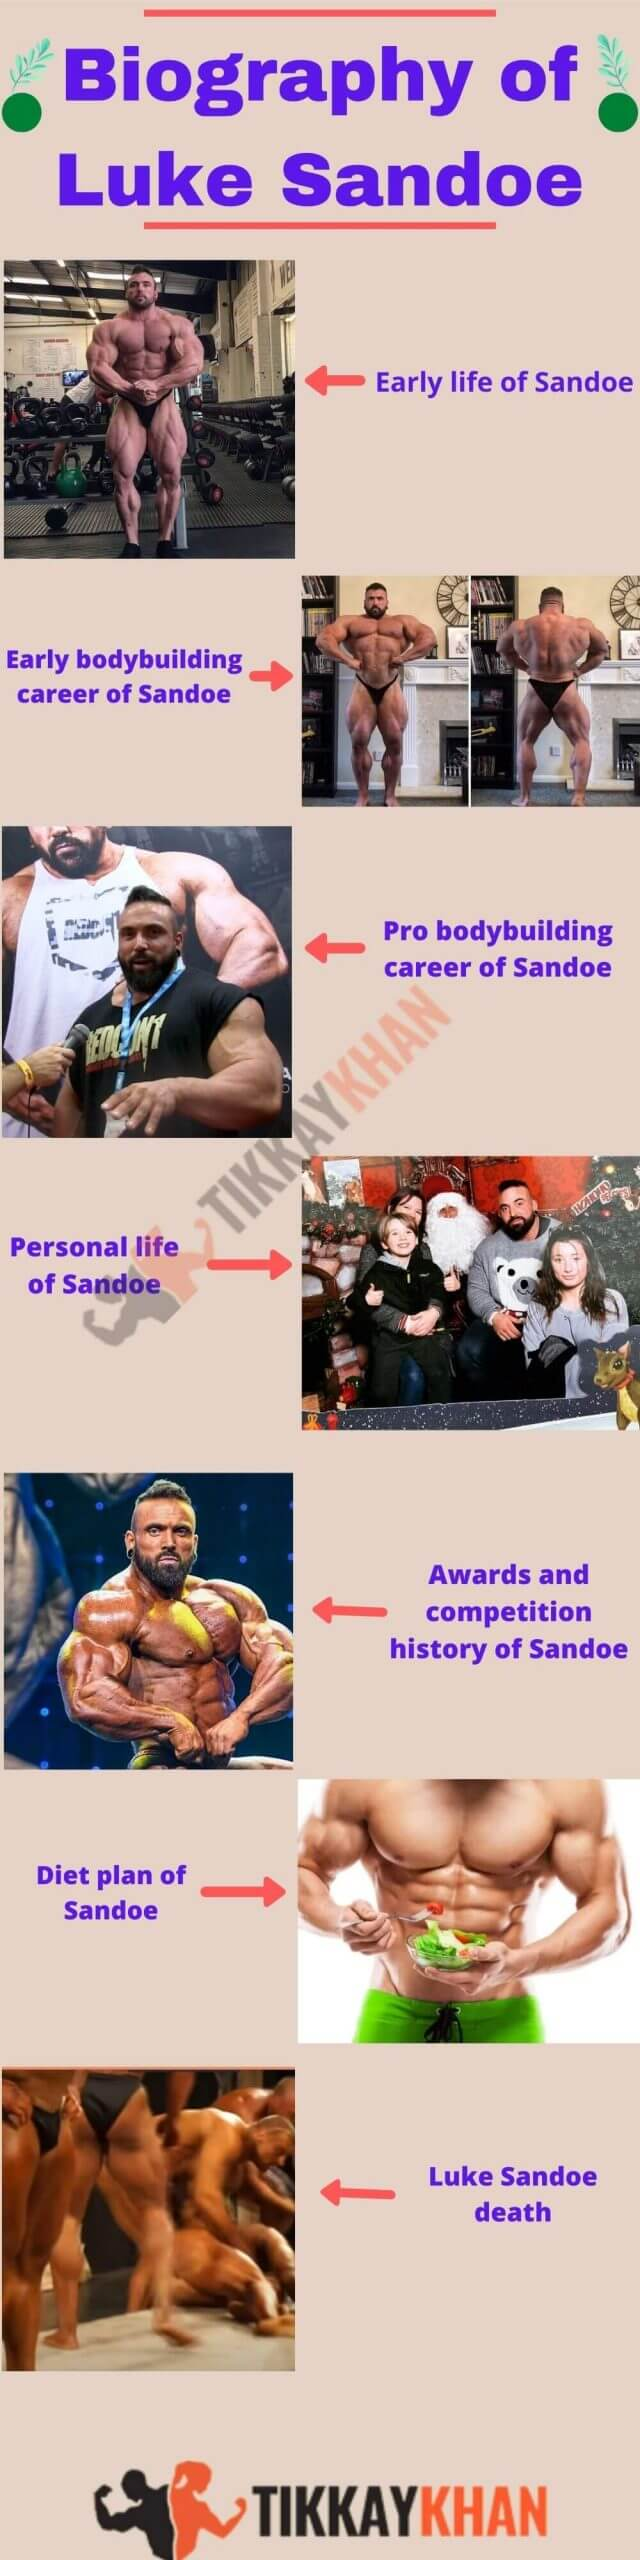 biography of luke sandoe infographic